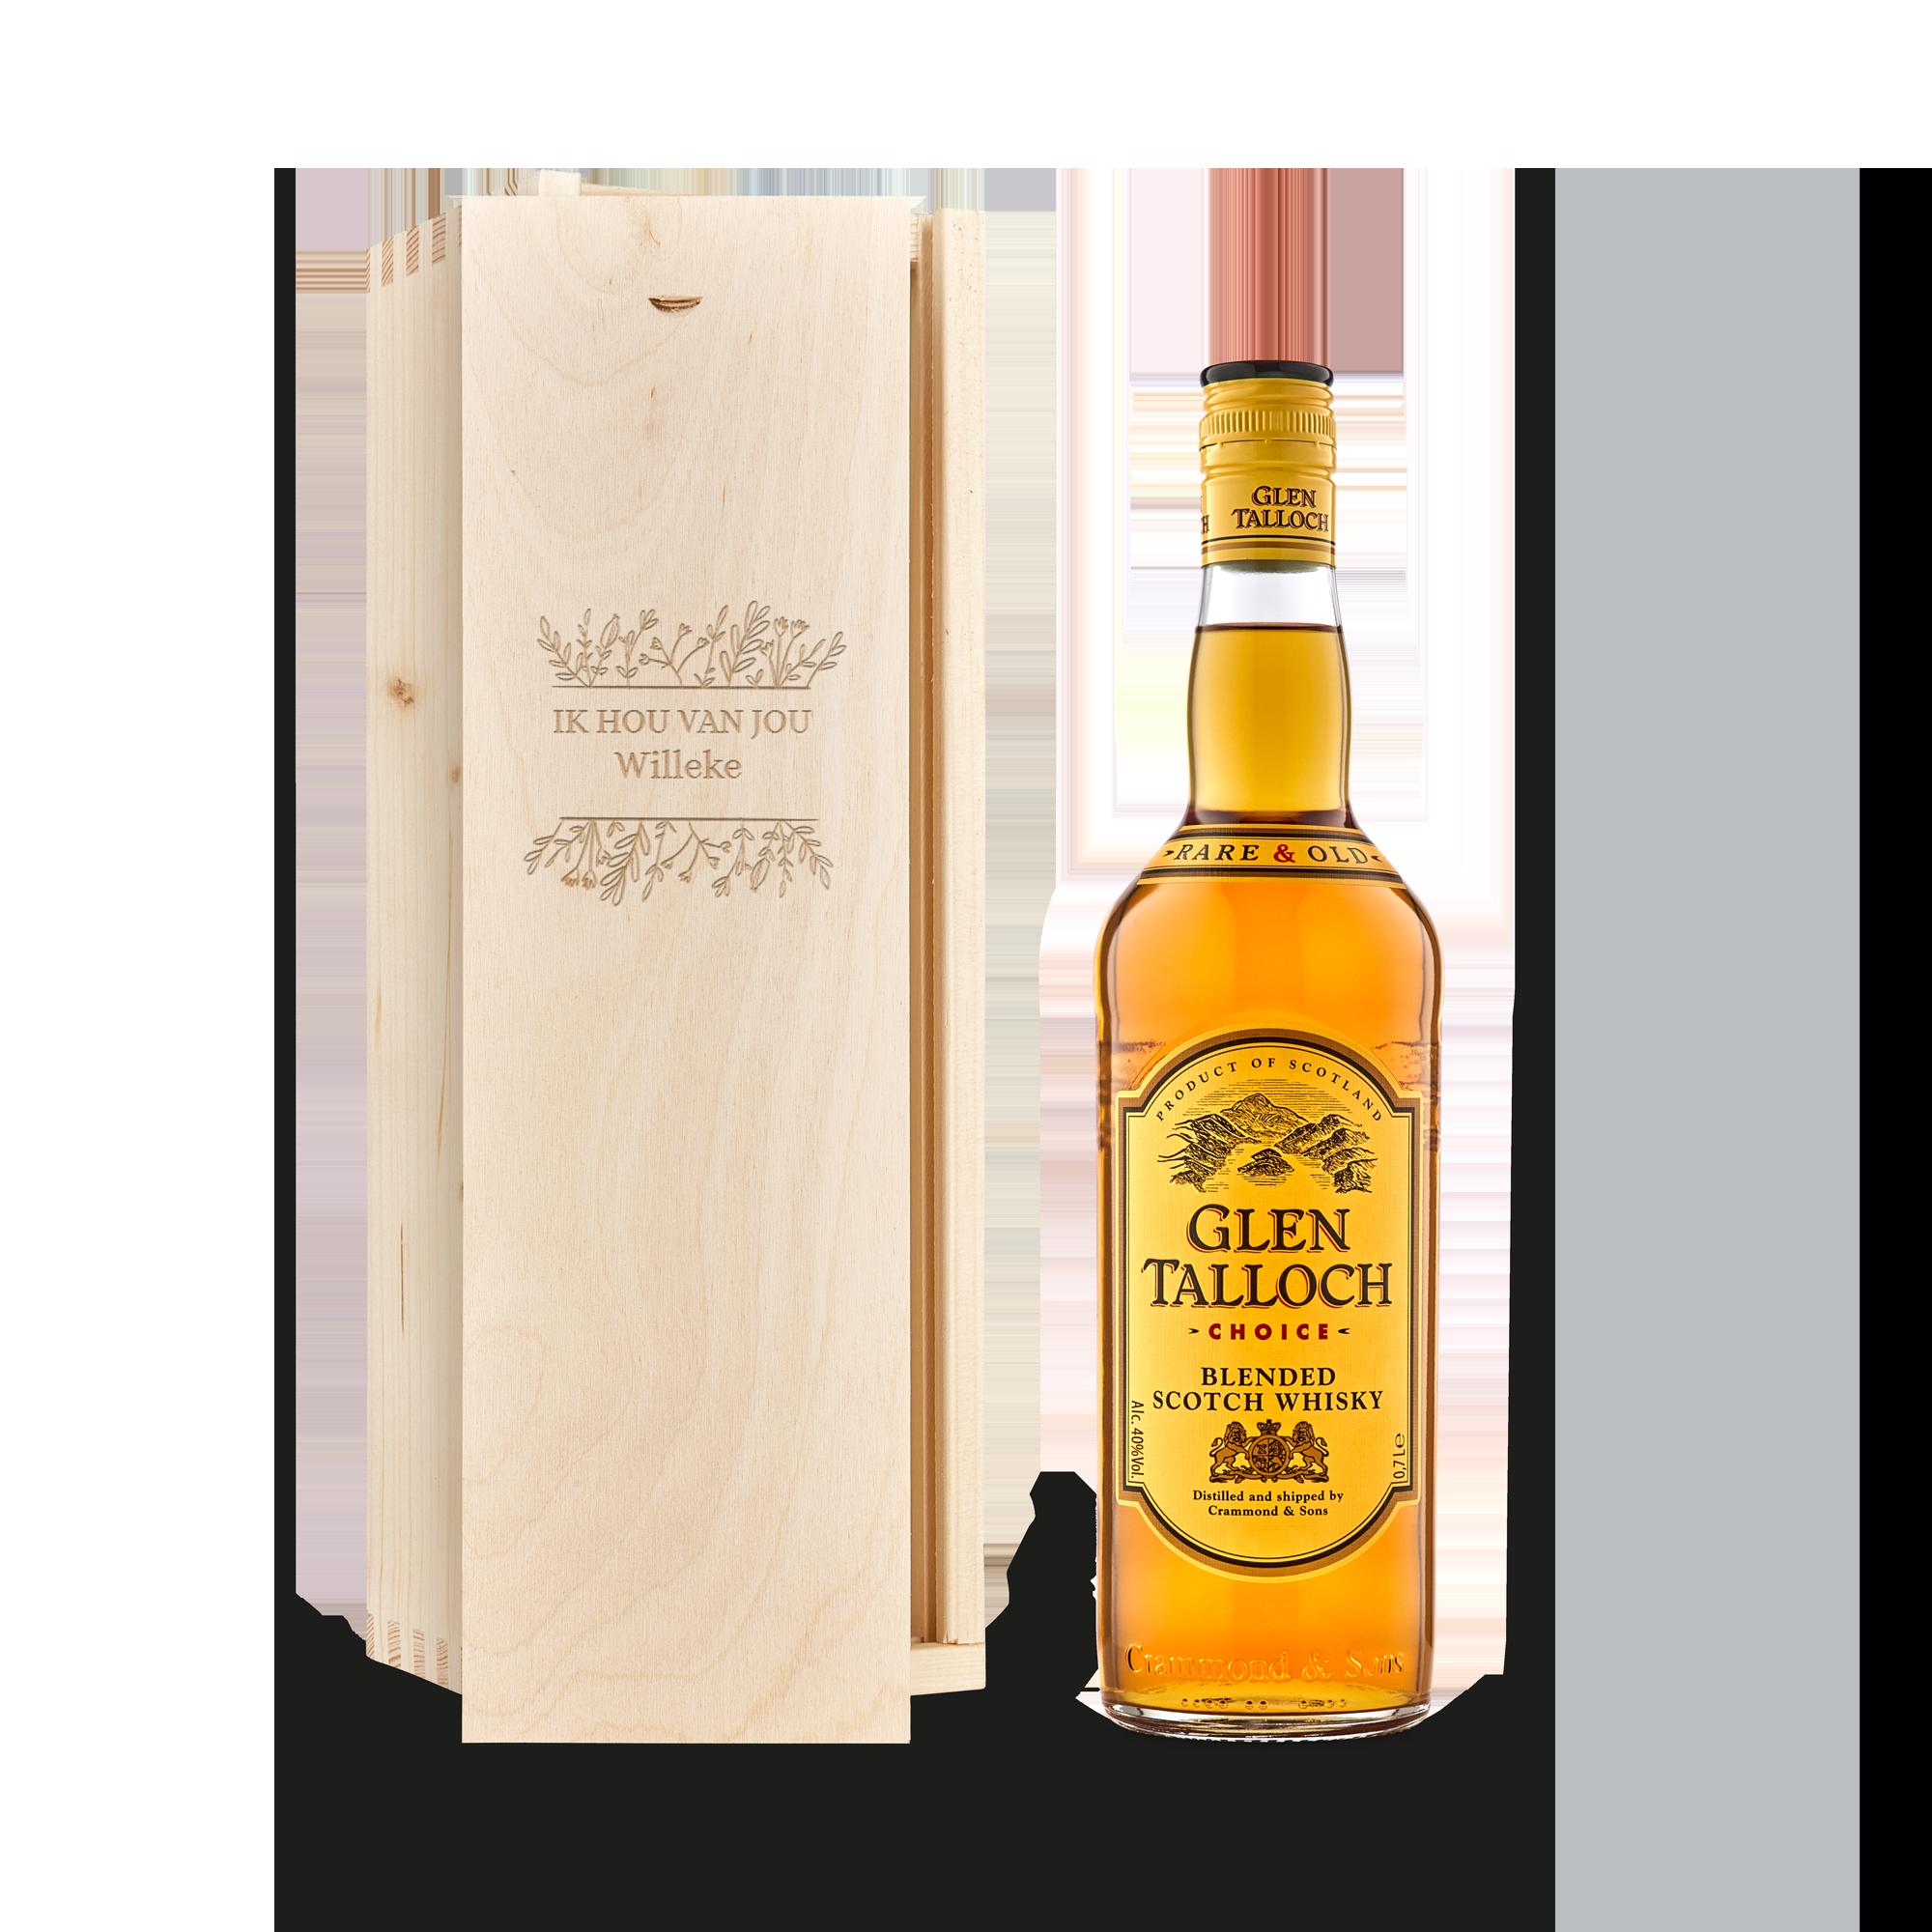 Whisky in gegraveerde kist - Glen Talloch